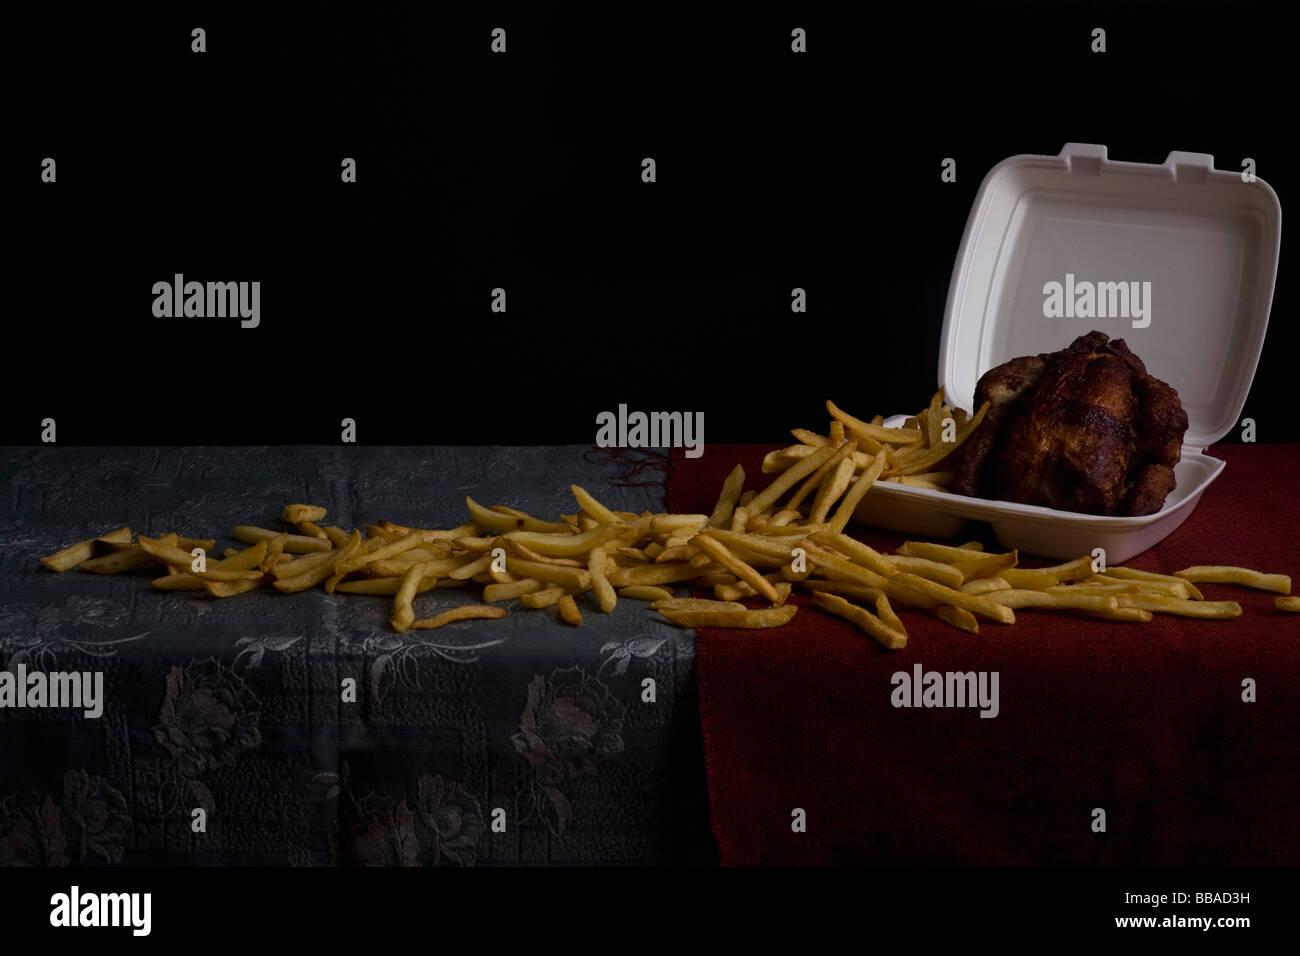 Pommes Frites und gebratenes Huhn, Stillleben Stockbild